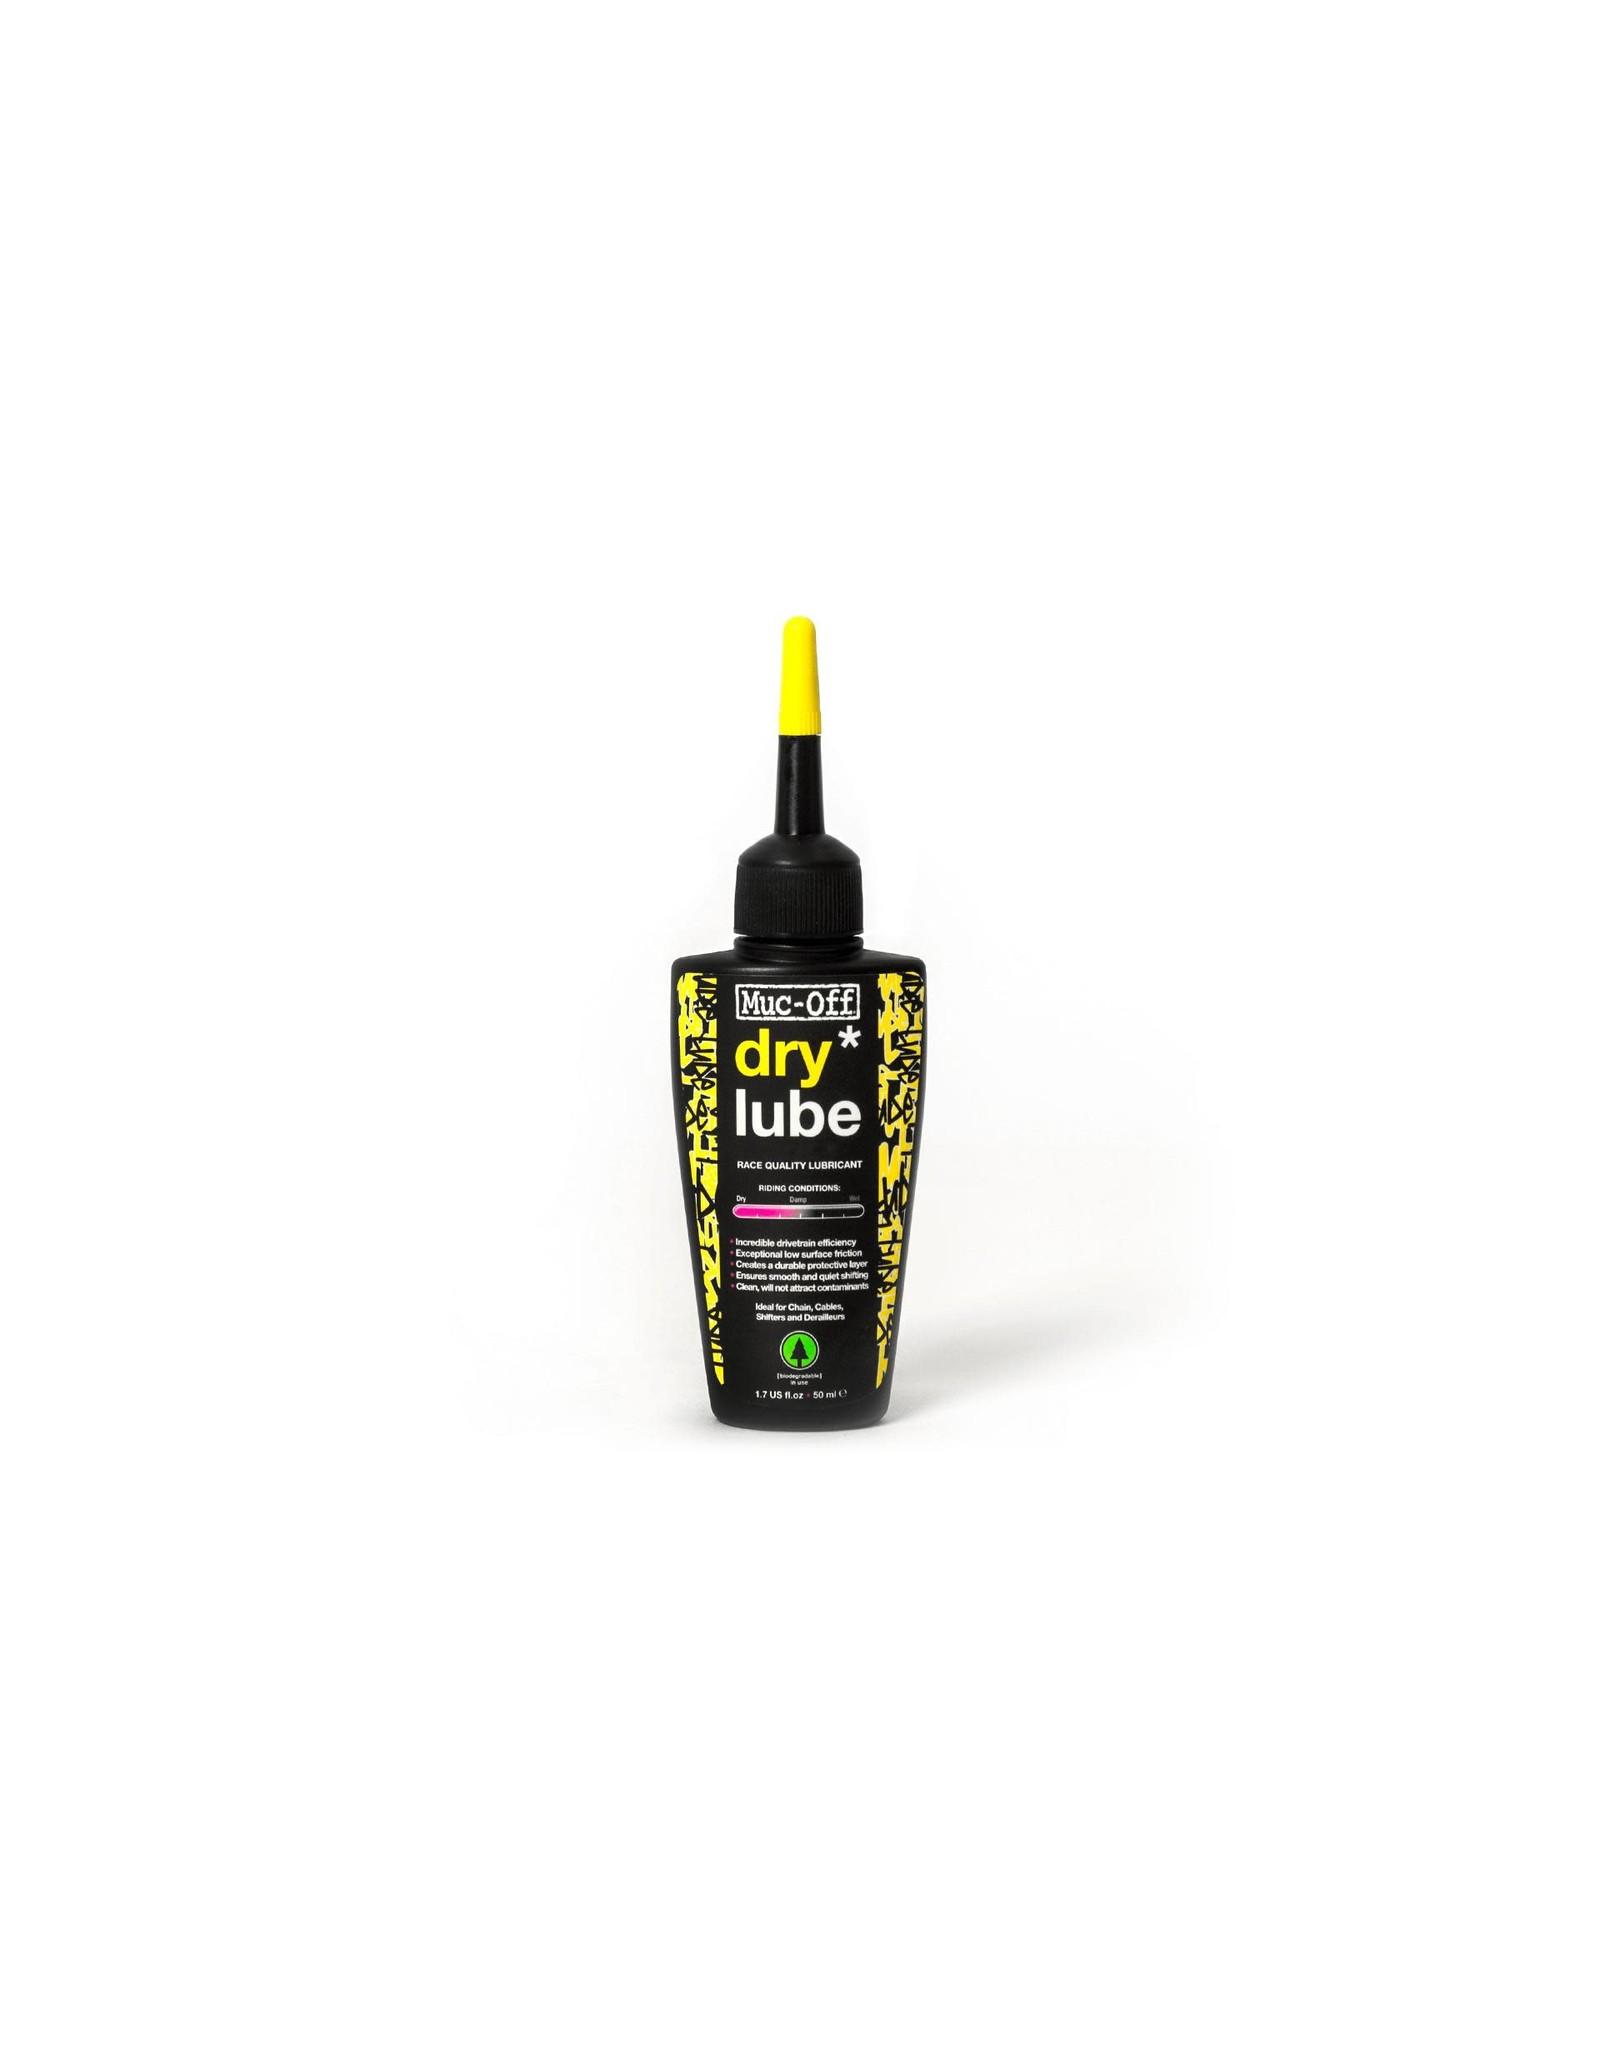 Muc-Off MCF Lube Dry 50ml #866